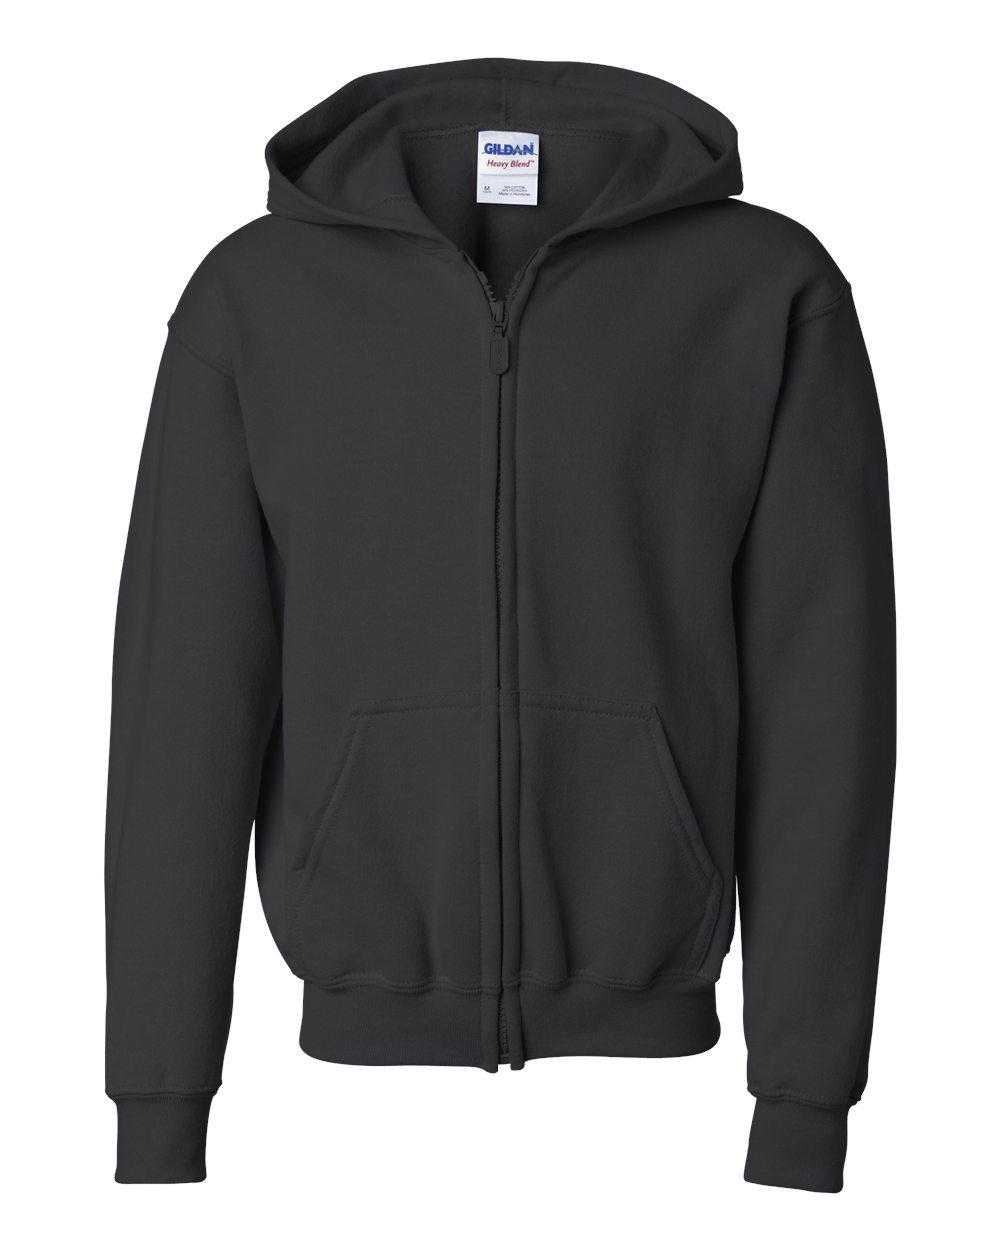 Picture of Gildan Youth Full Zip Hooded Sweatshirt